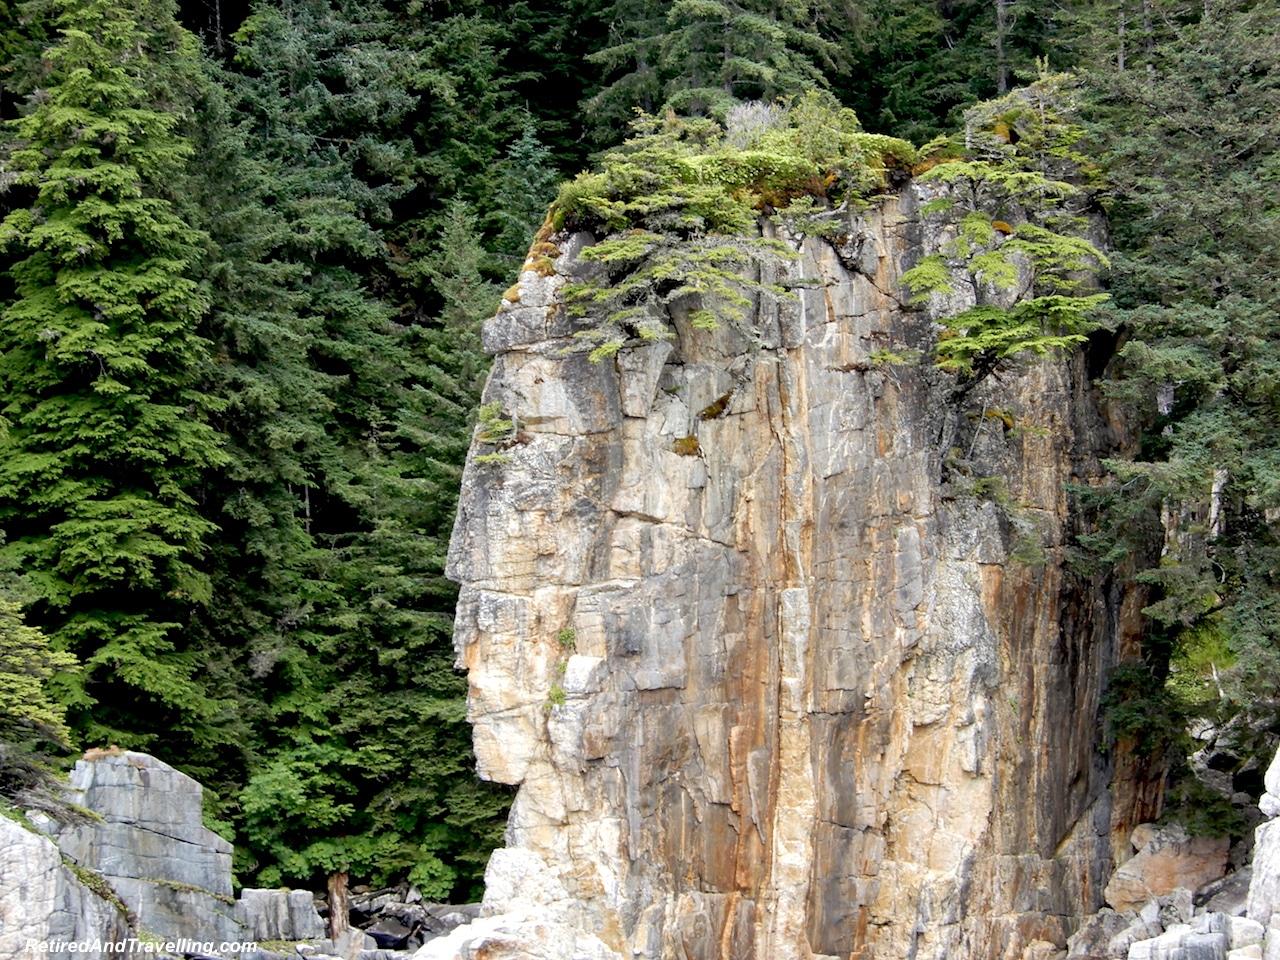 Prince Rupert Portland Inlet Indian Head Rock - Alaska cruise for grizzly bears.jpg